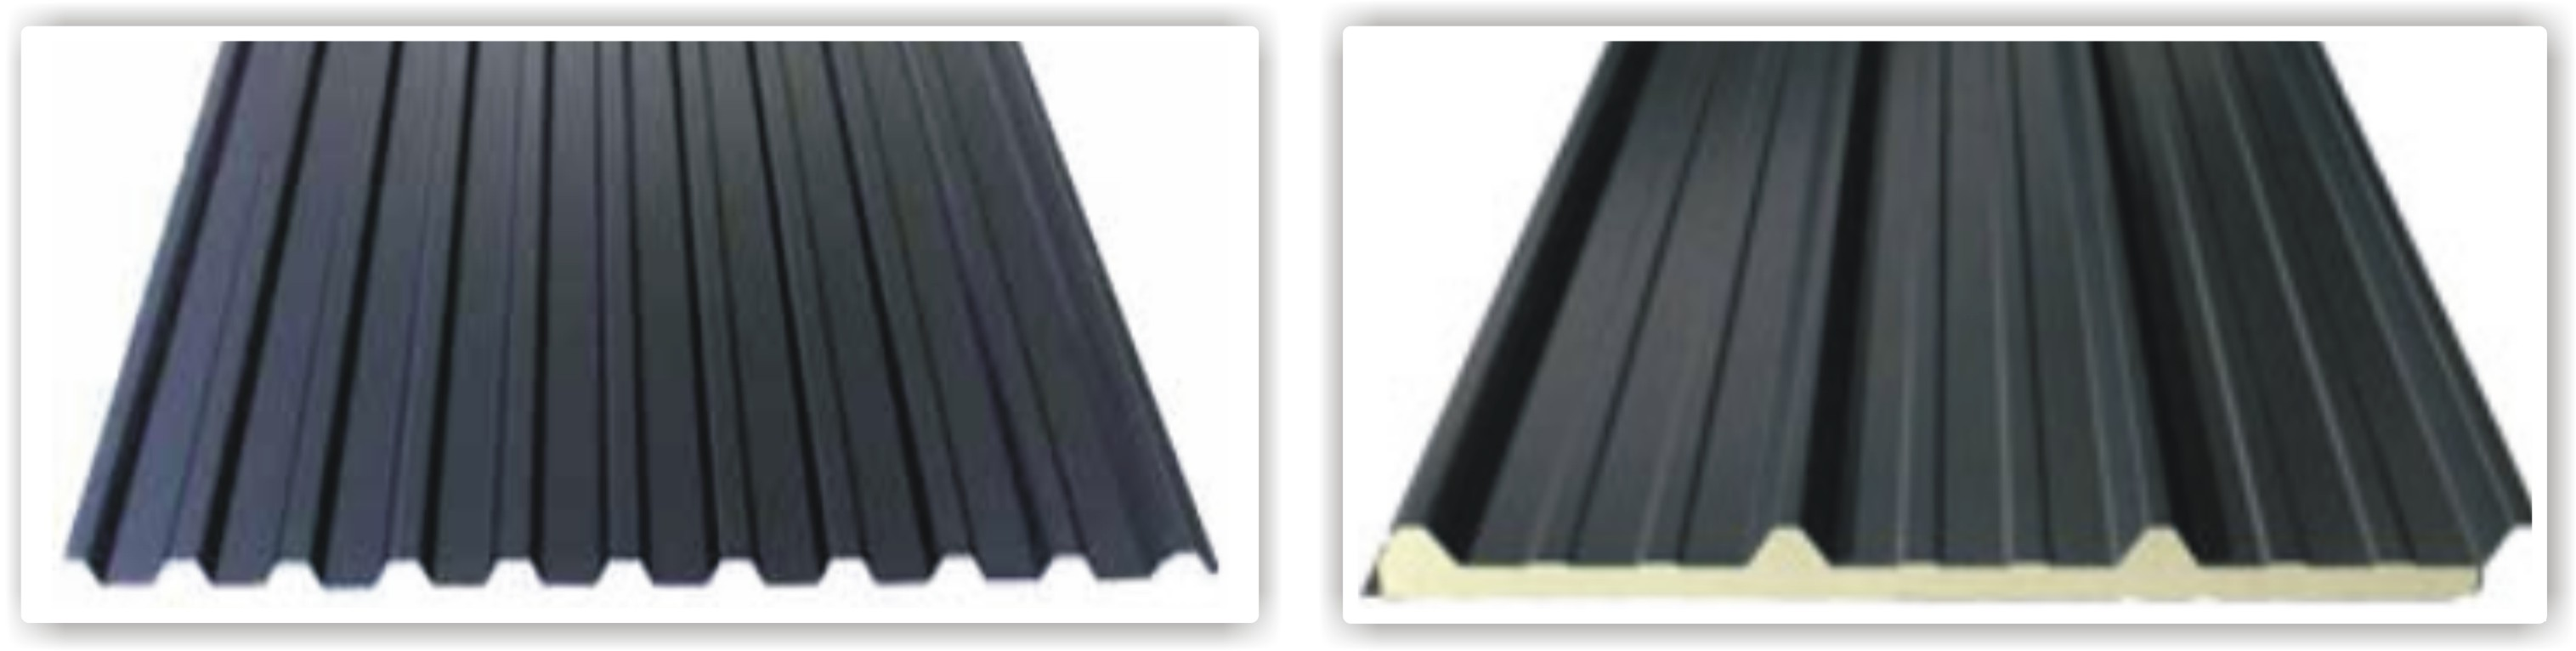 Fertiggaragen Dach & Blende - Fertiggaragen und Carports